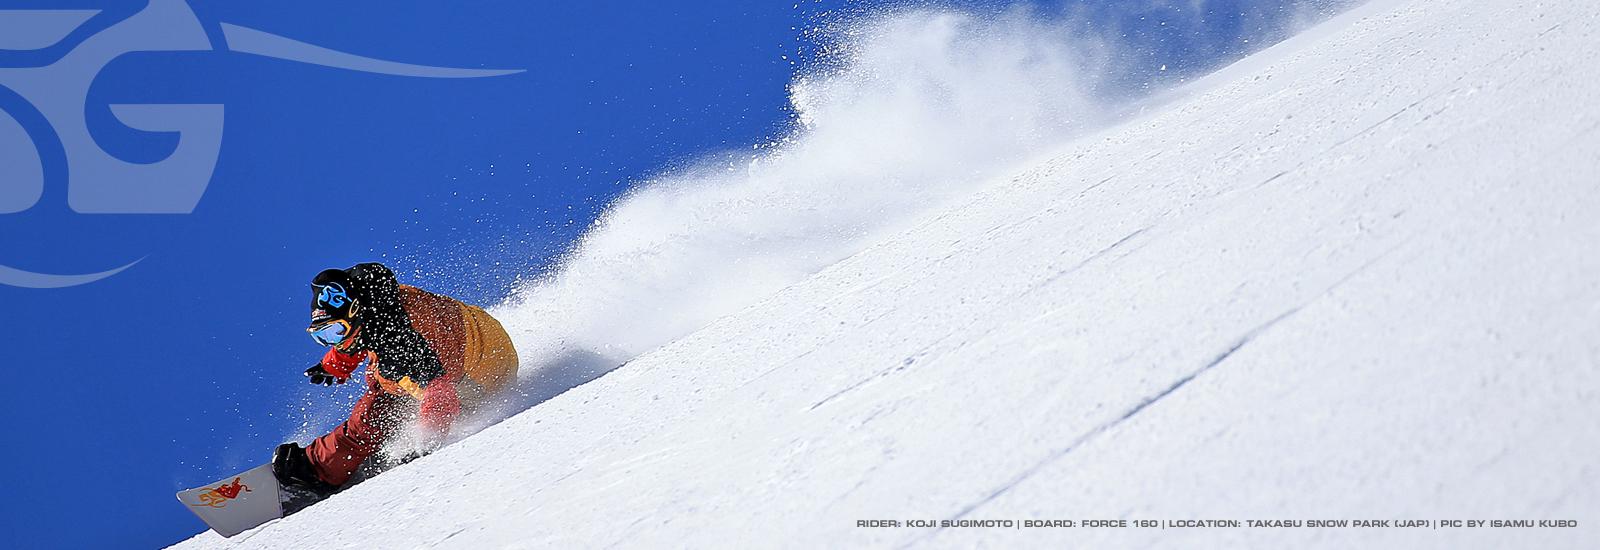 SG SNOWBOARDS Koji Sugimoto FORCE 160 16-17 Takasu Snow Park Japan by Isamu Kubo